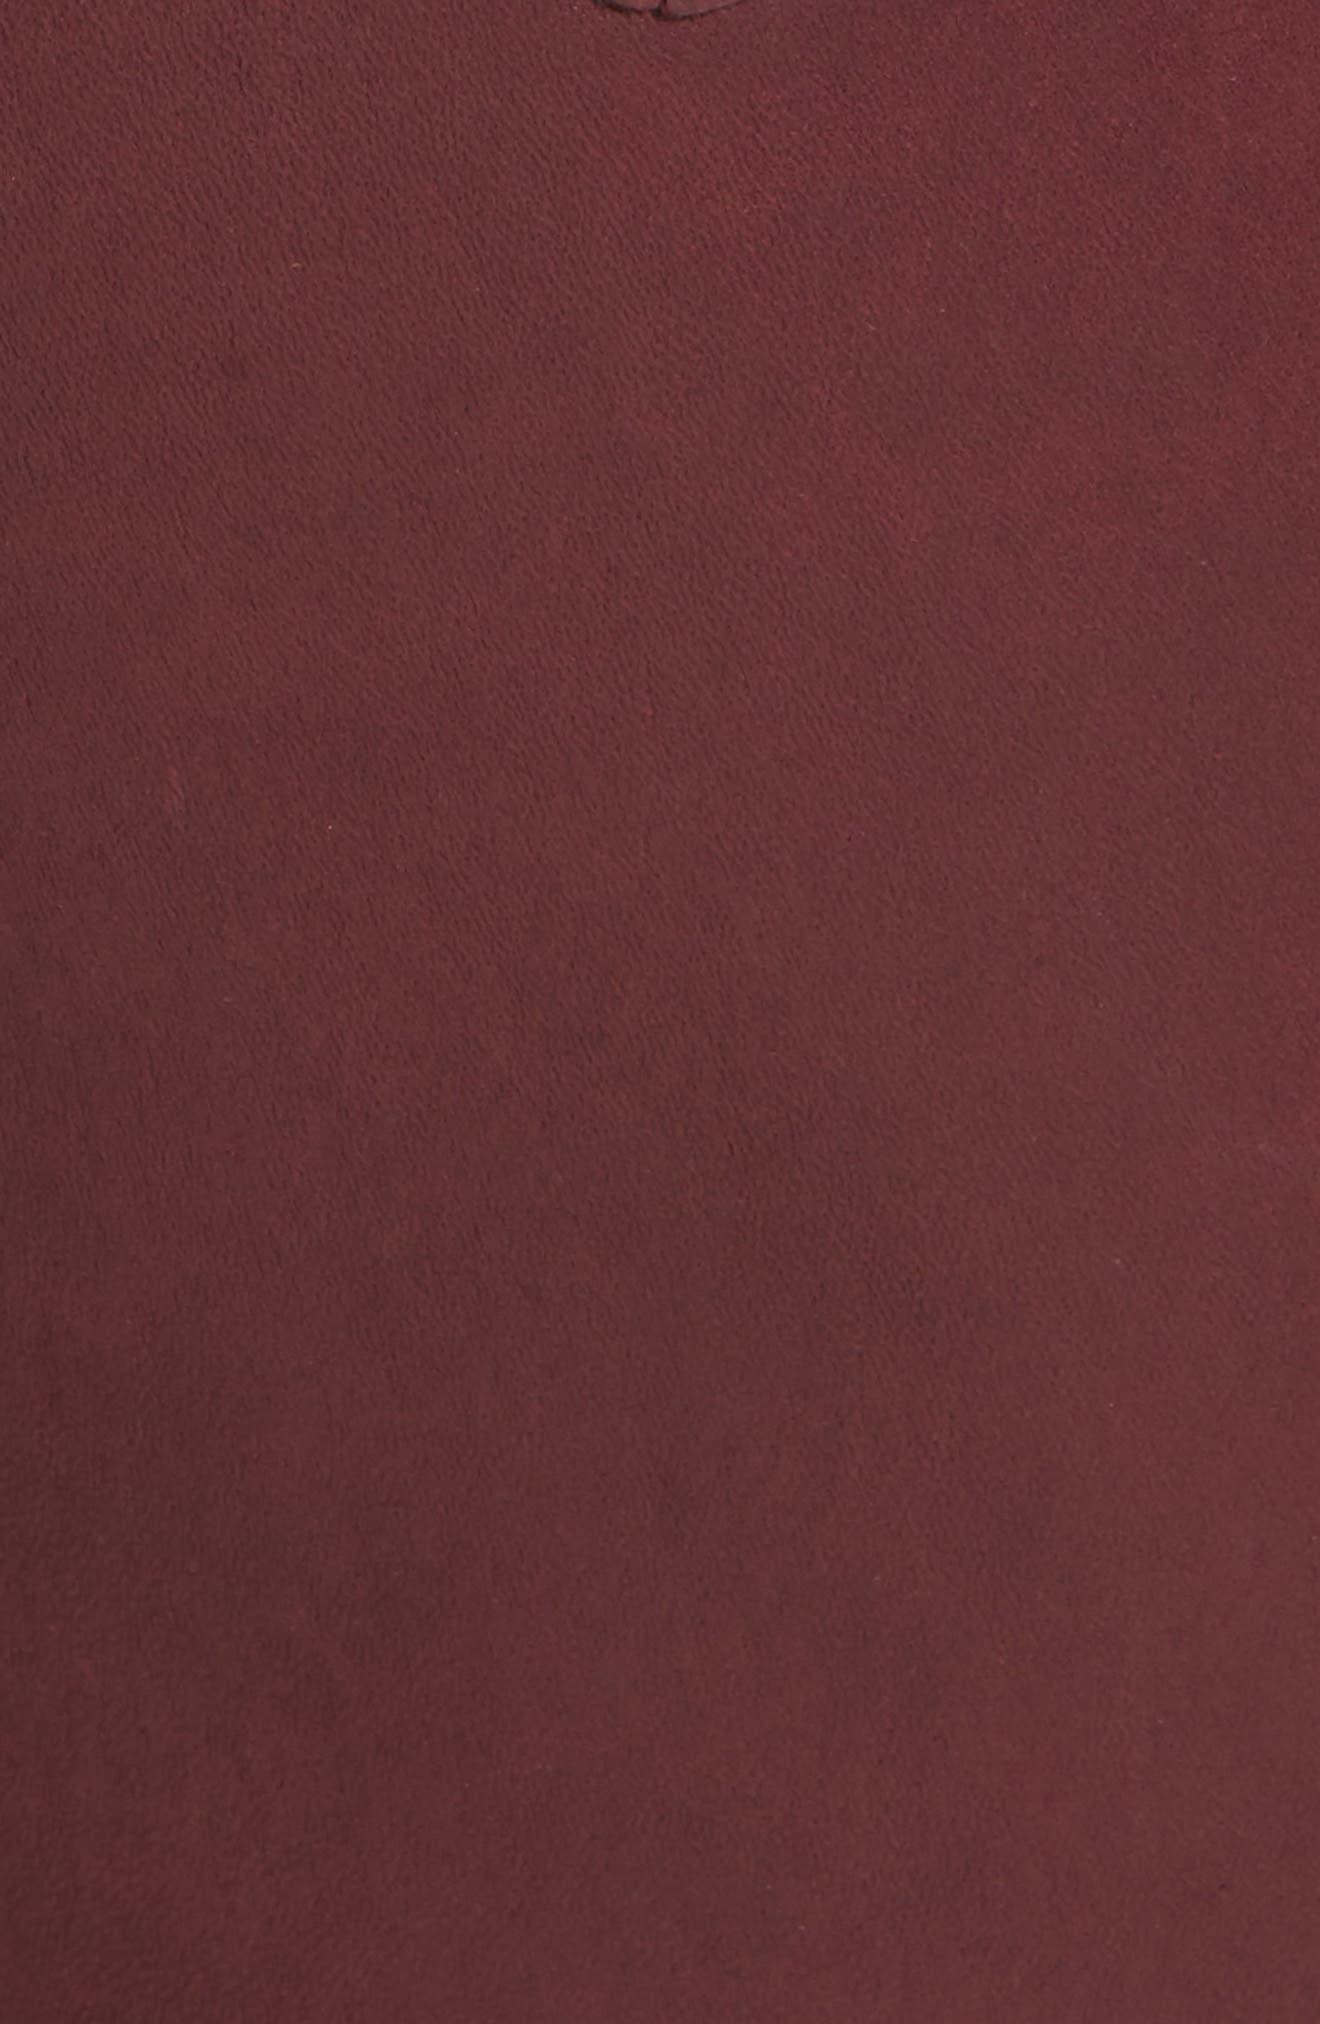 Lambskin Leather Pants,                             Alternate thumbnail 20, color,